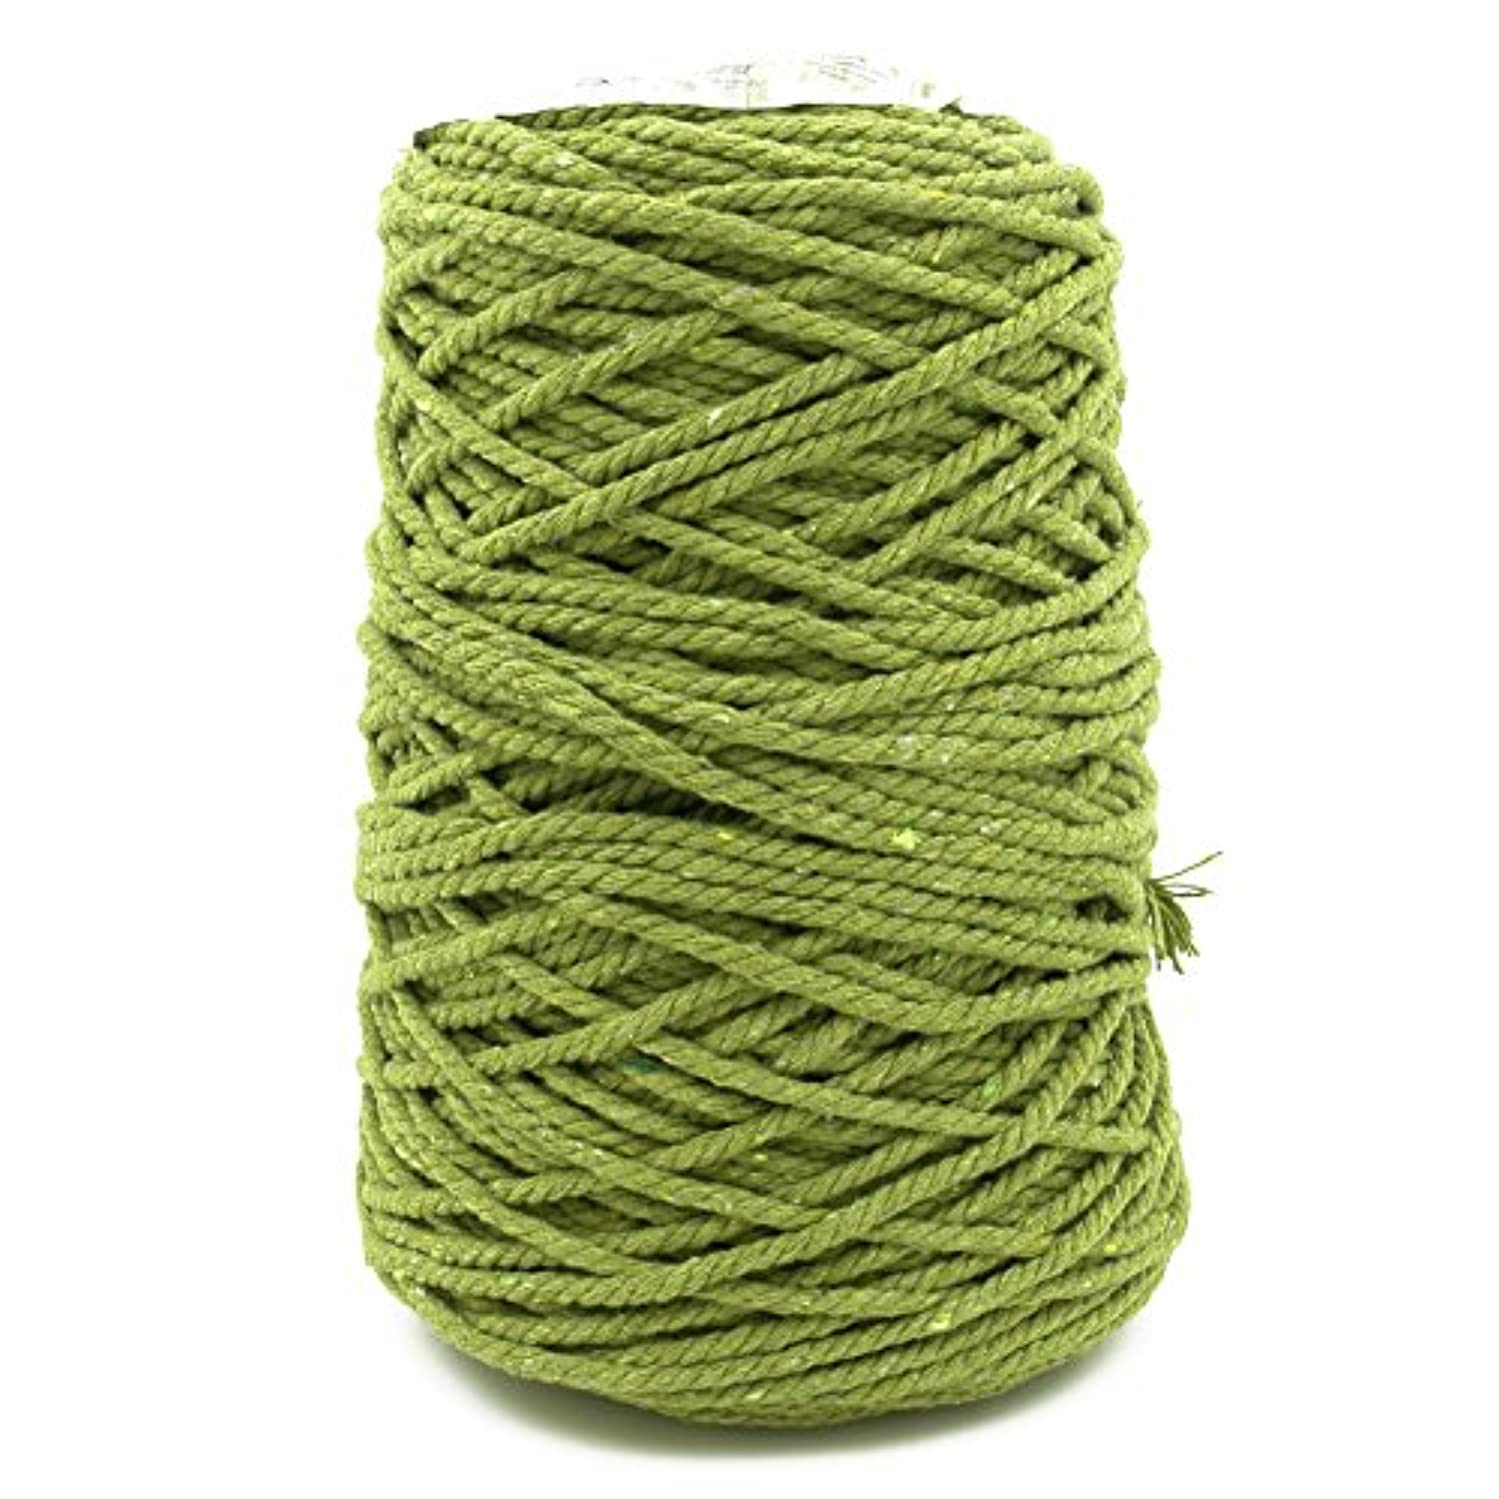 Charmkey Fashion Cotton Yarn 100% Soft Cotton 4 Medium Gauge for Crocheting and Knitting Projects DIY Crafts,17.6 Oz/500g (Grass Green)